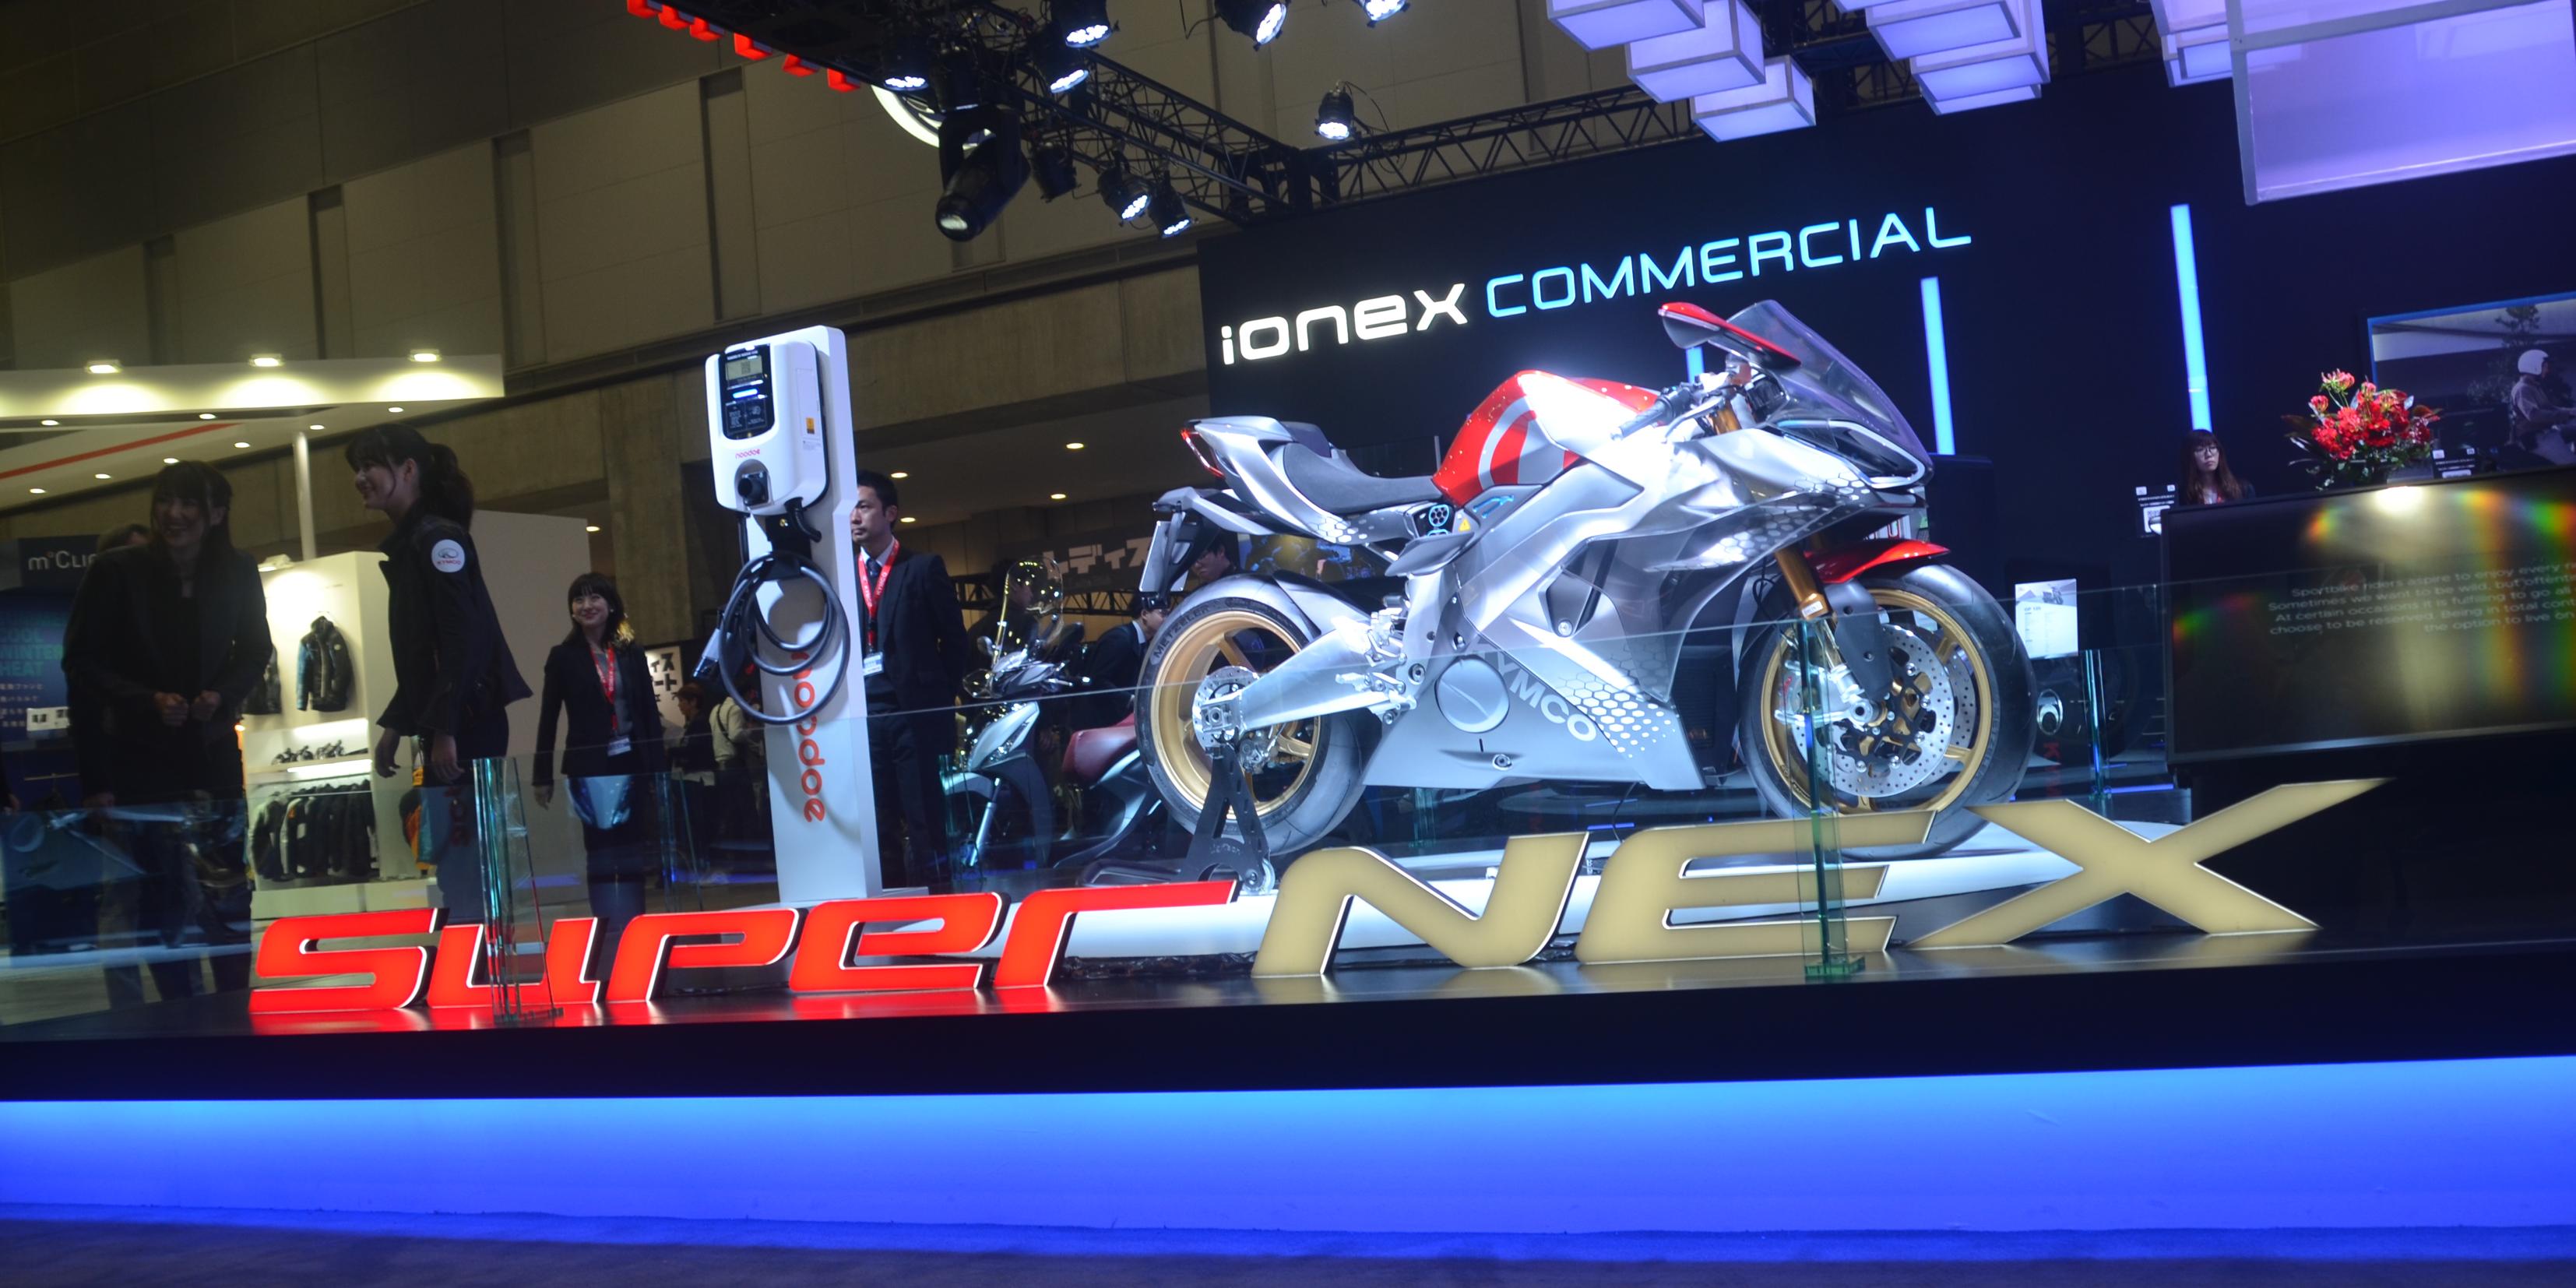 Kymco Shows Off Supernex Electric Sport Bike Alongside Noodoe Charging Partnership